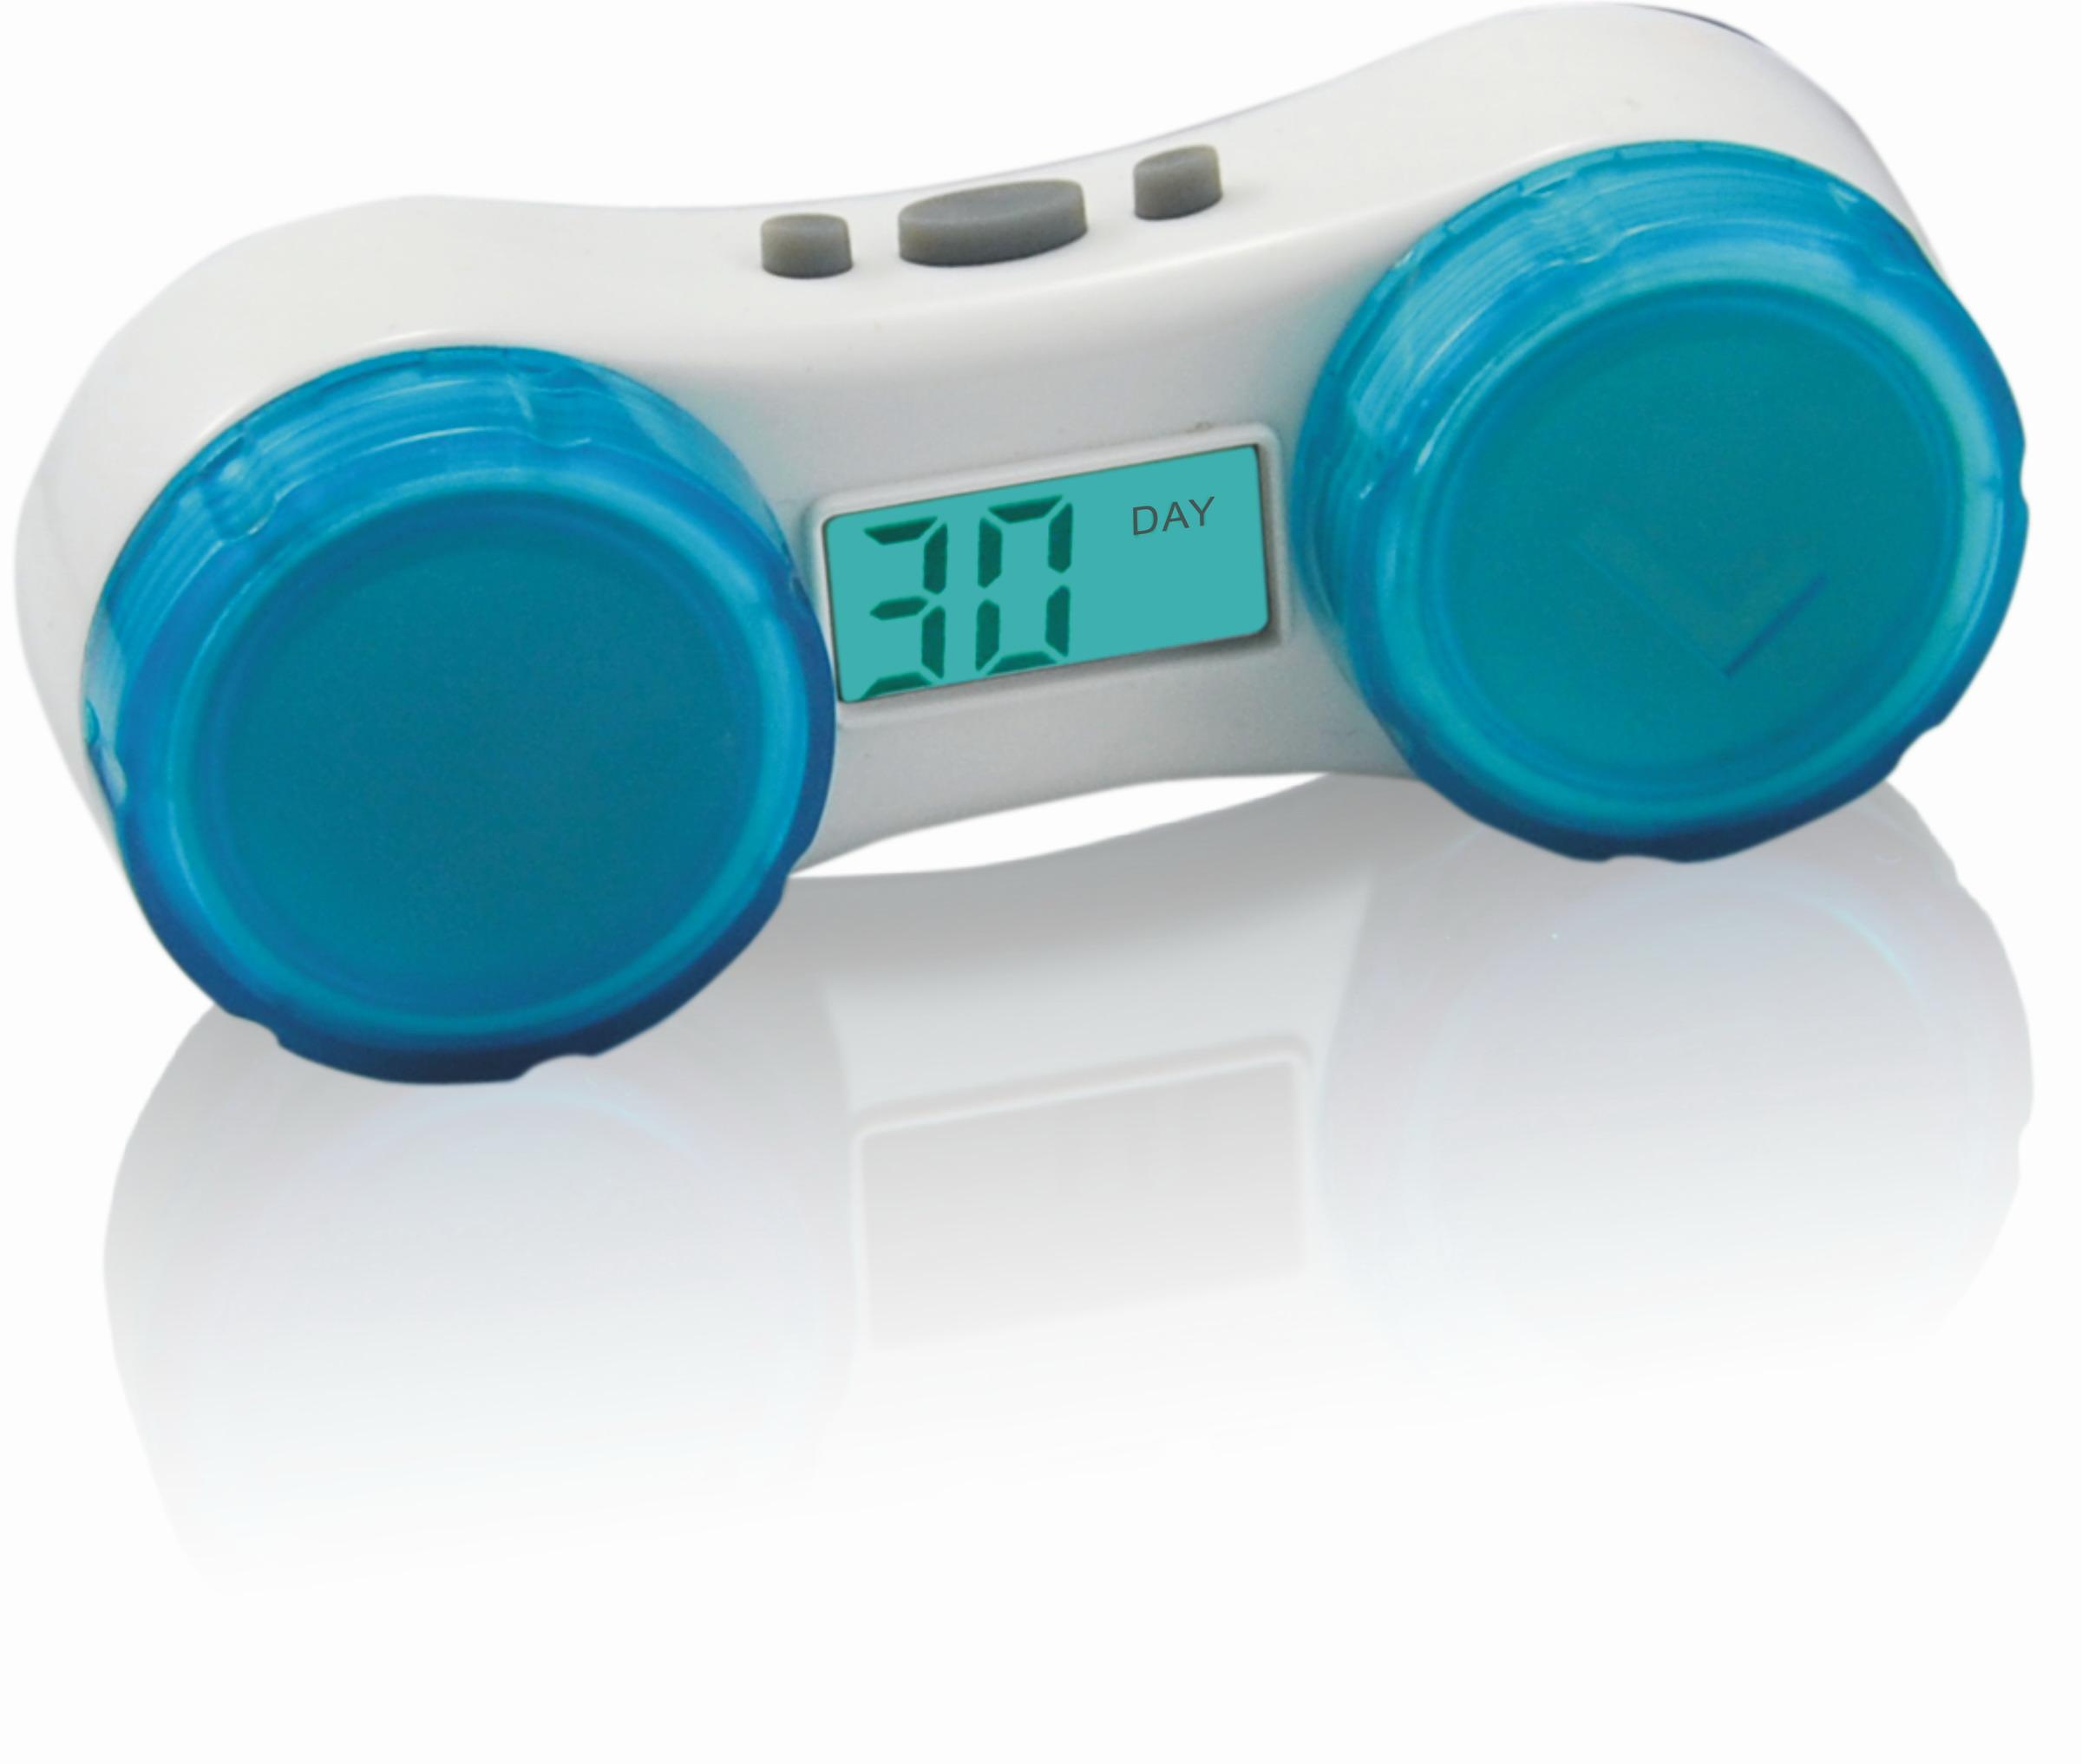 Contact Lenses Design Software